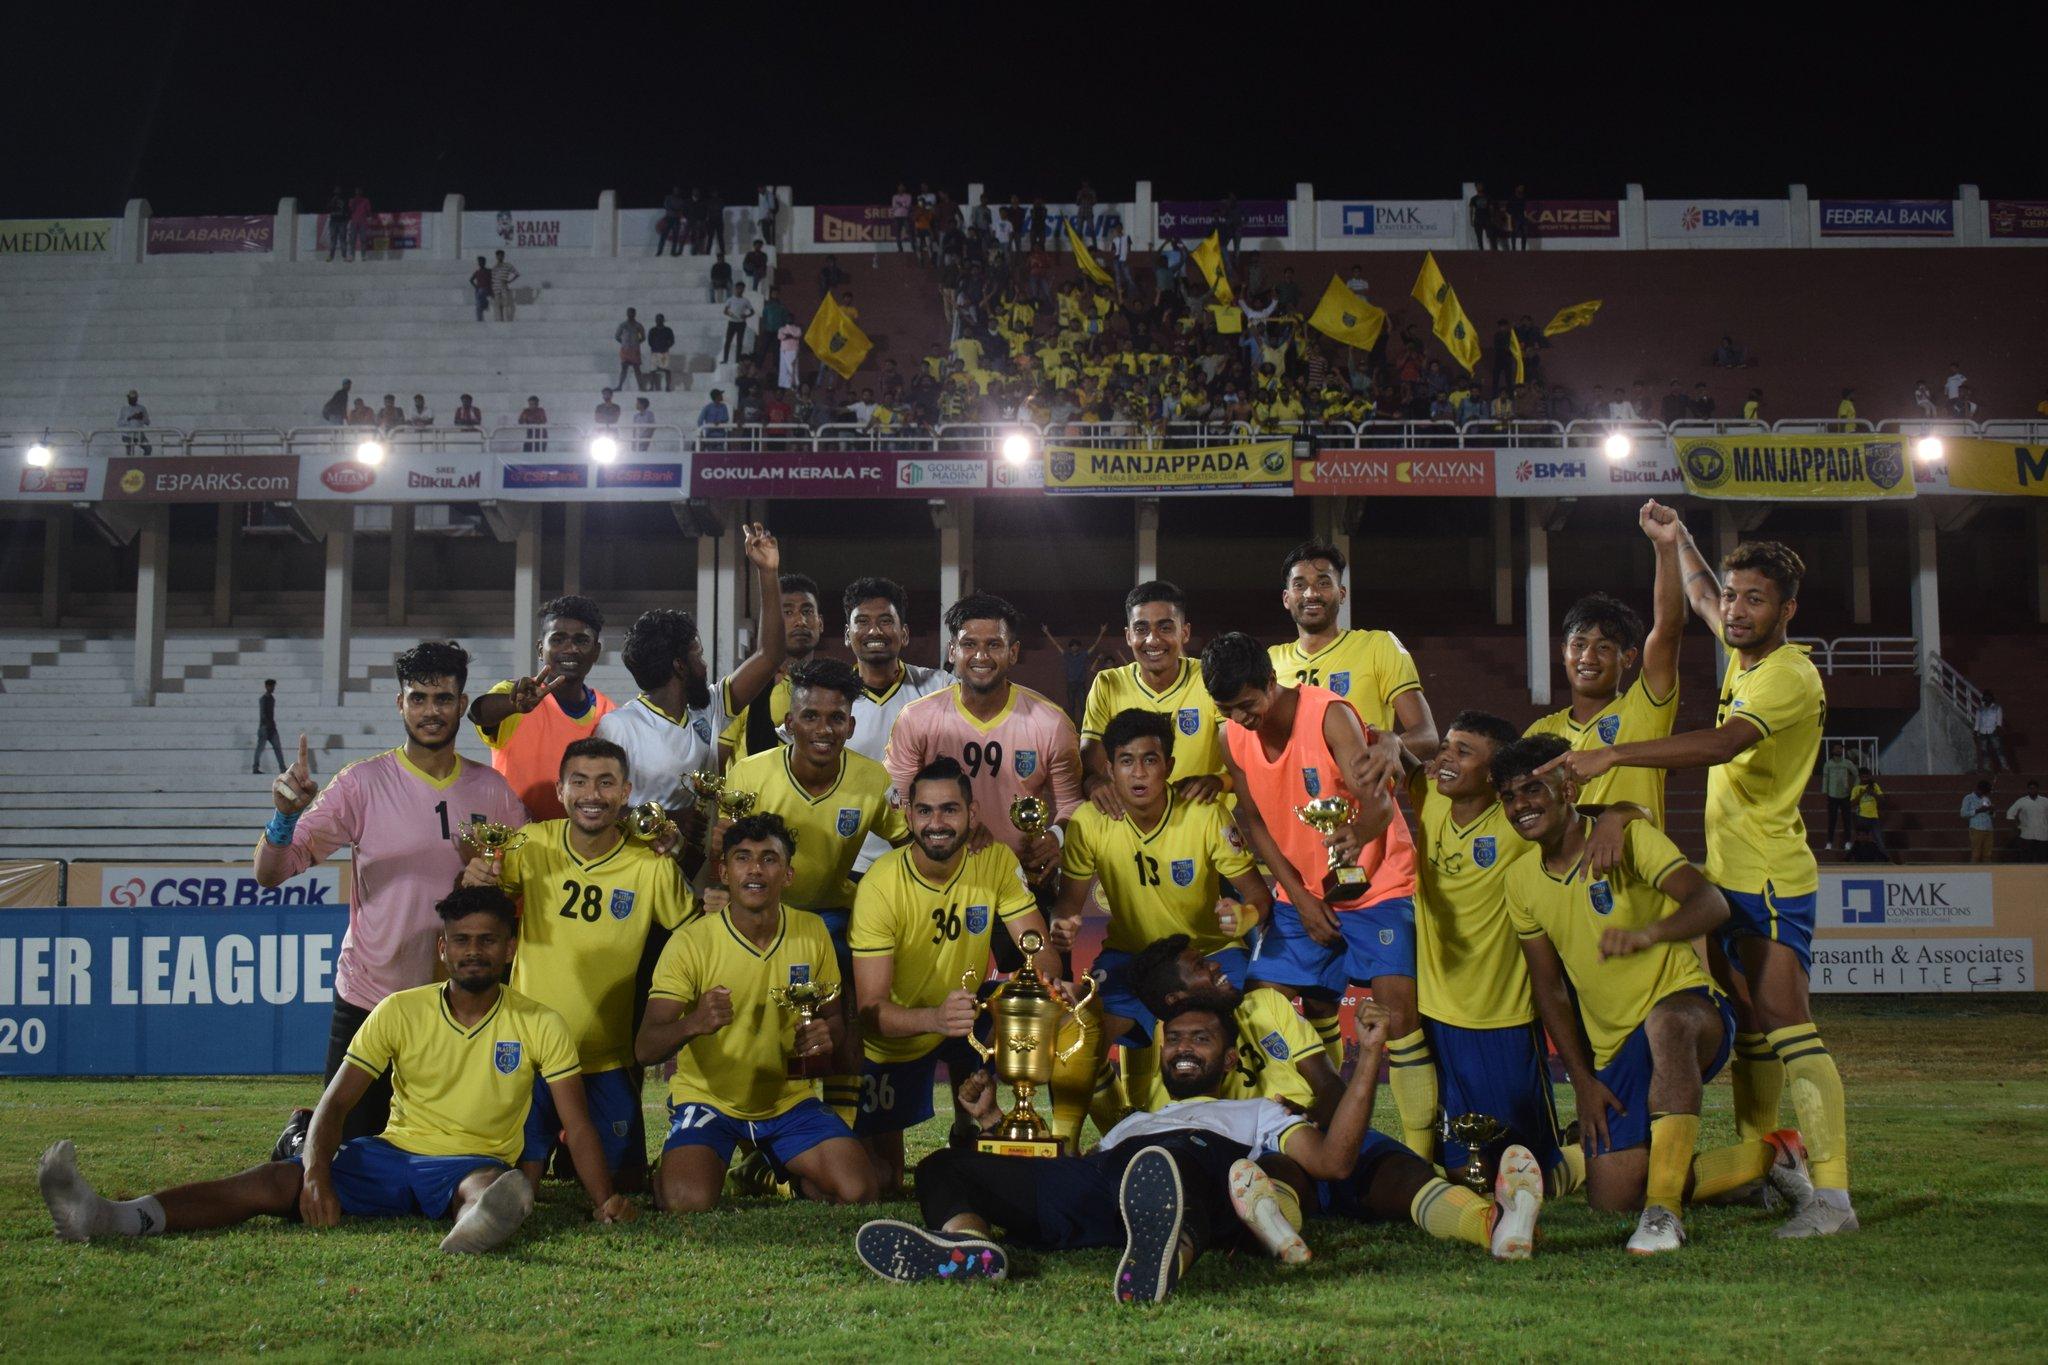 Kerala Premier League 2019-20 Champions